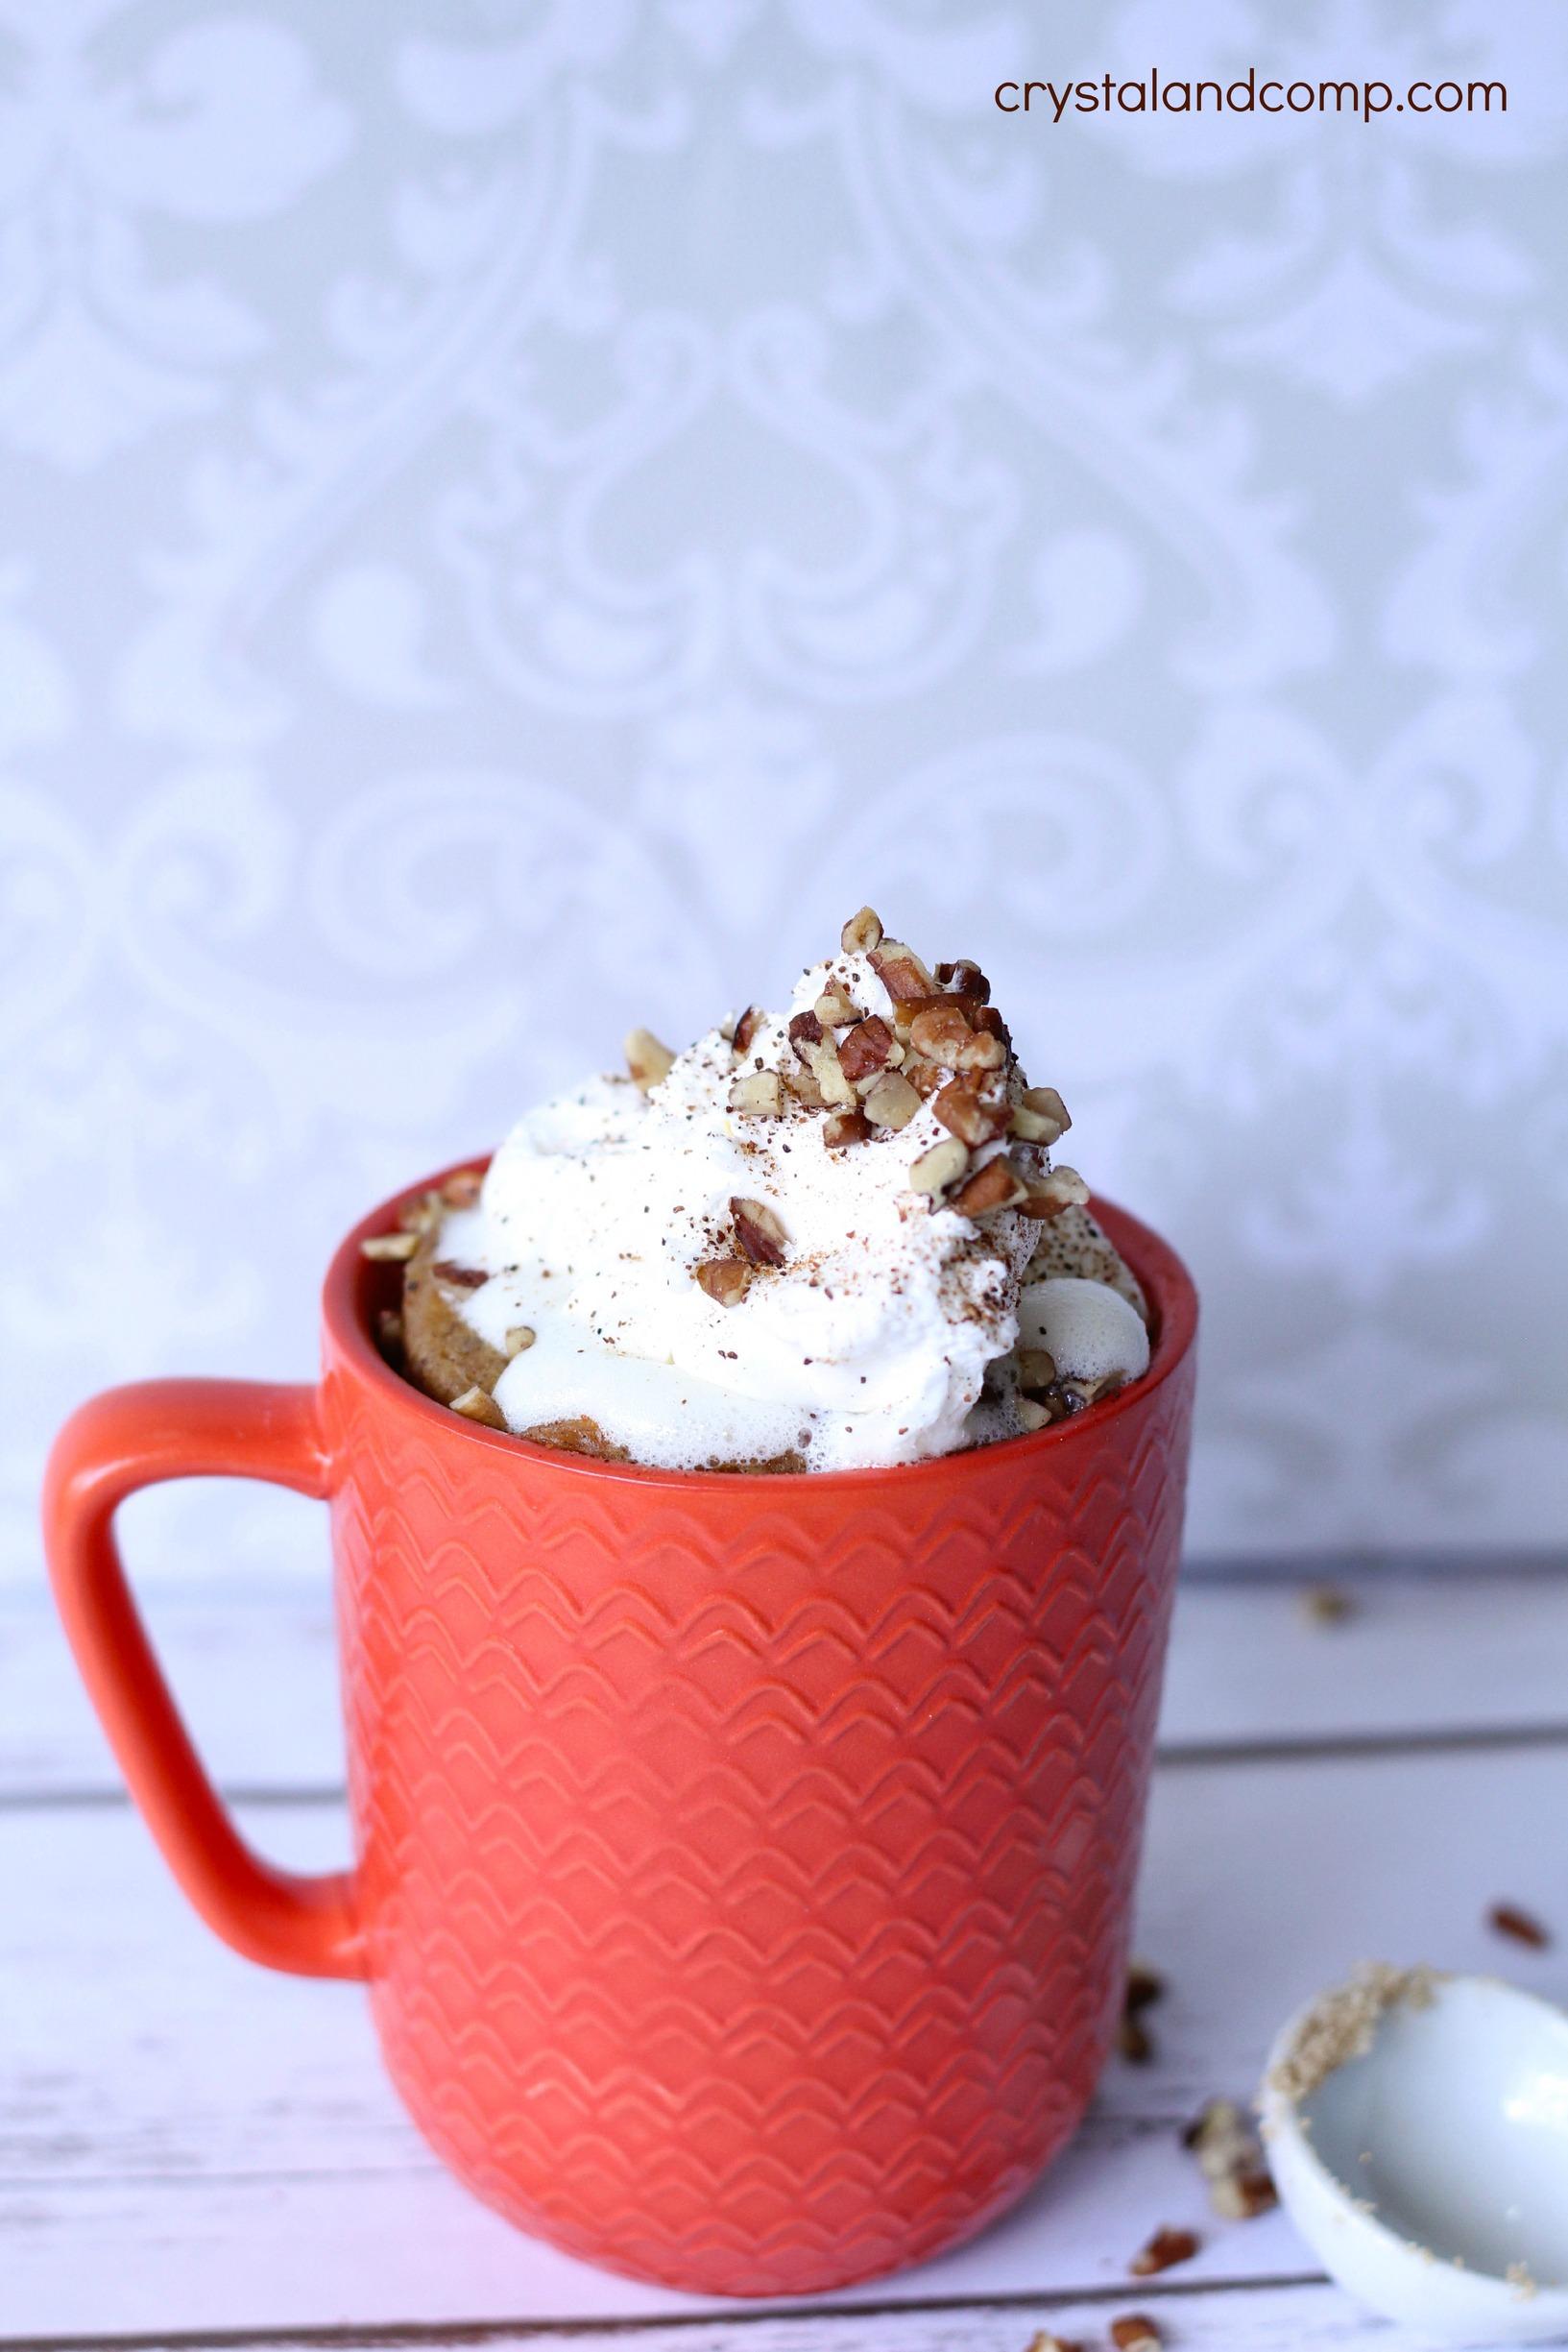 microwave mug cake carrot cake hot chocolate clipart pinterest hot chocolate clipart images